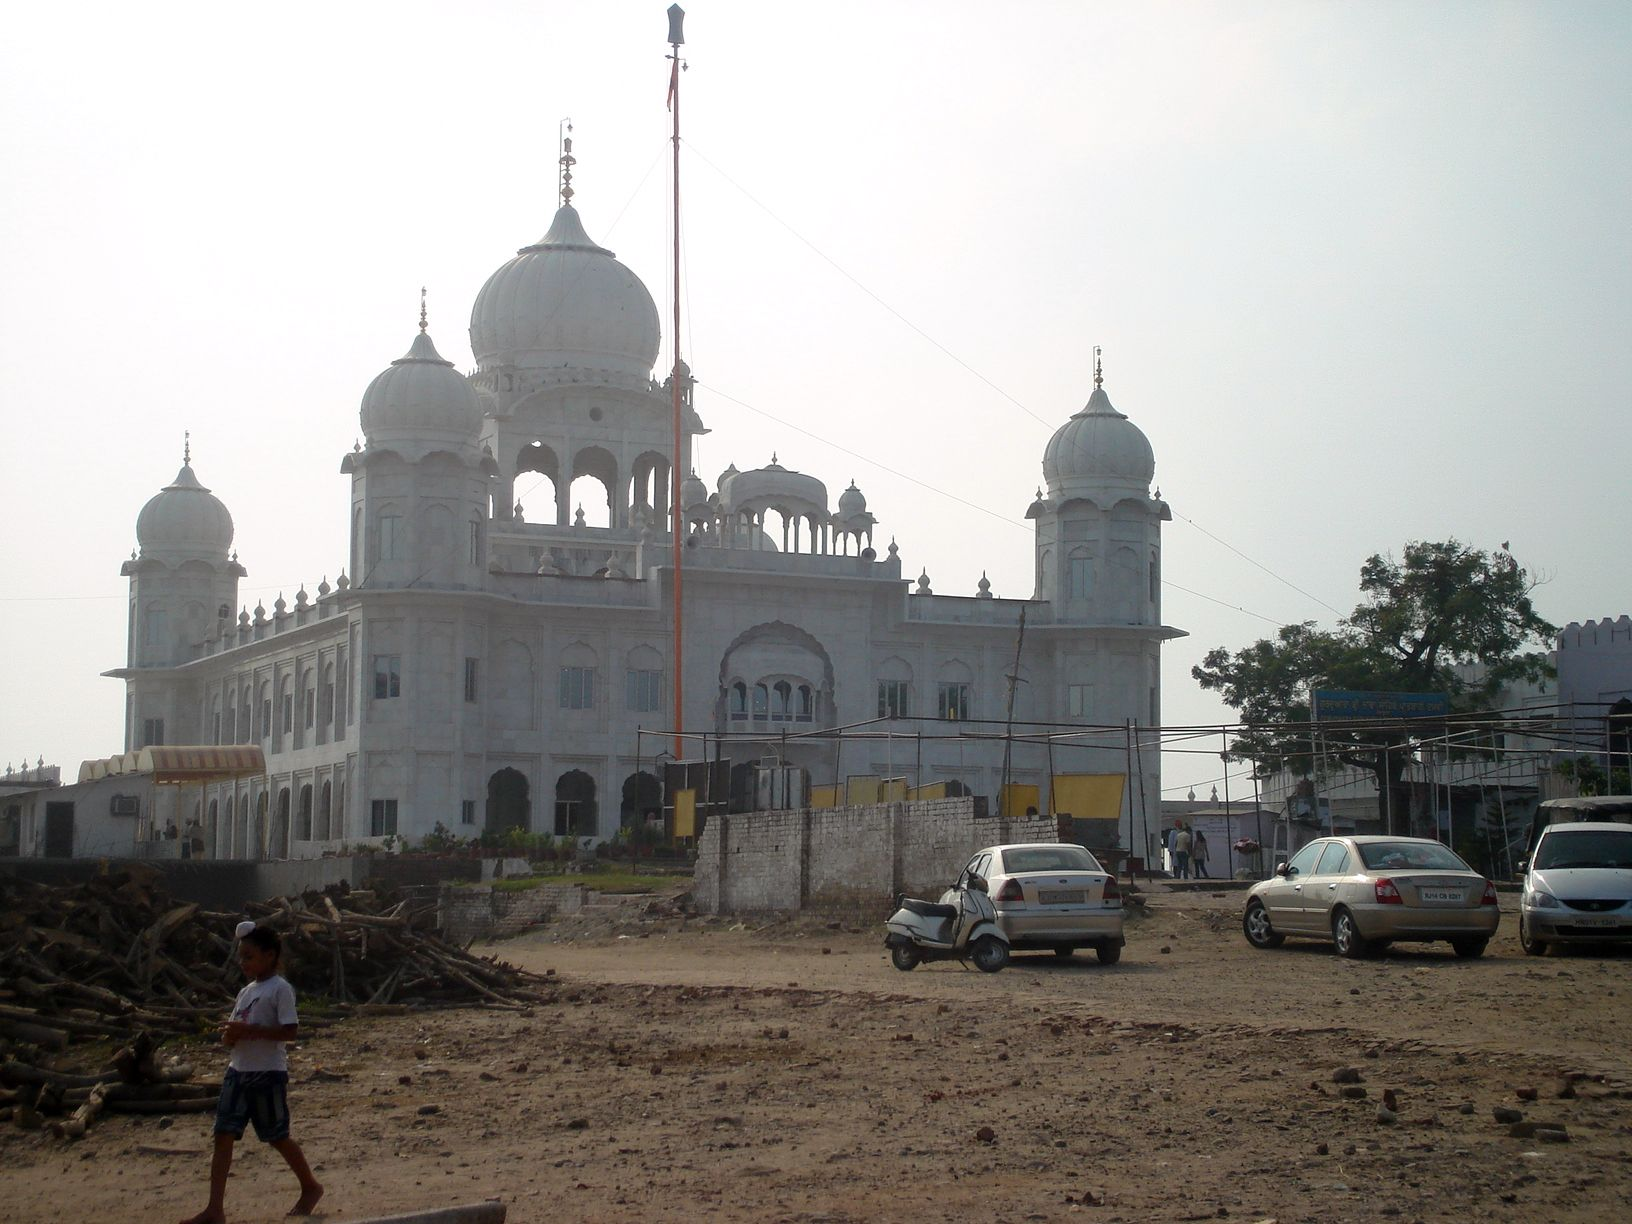 Gurudwara Nada Sahib - Panchkula, Haryana